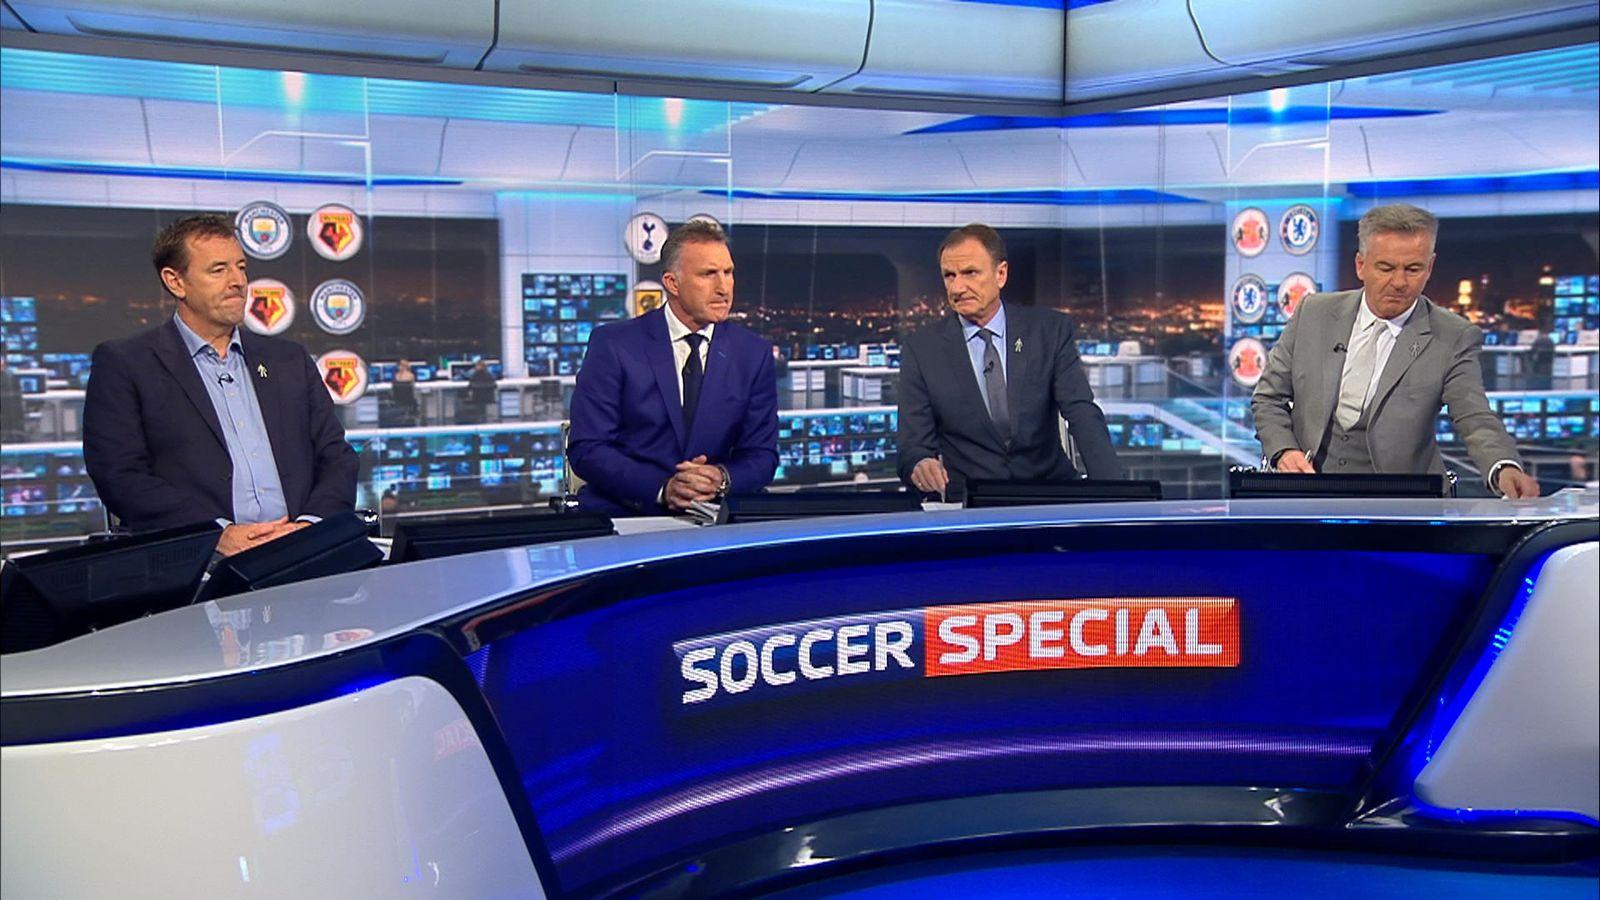 Soccer Special live stream on SkySports.com and Sky Sports ...